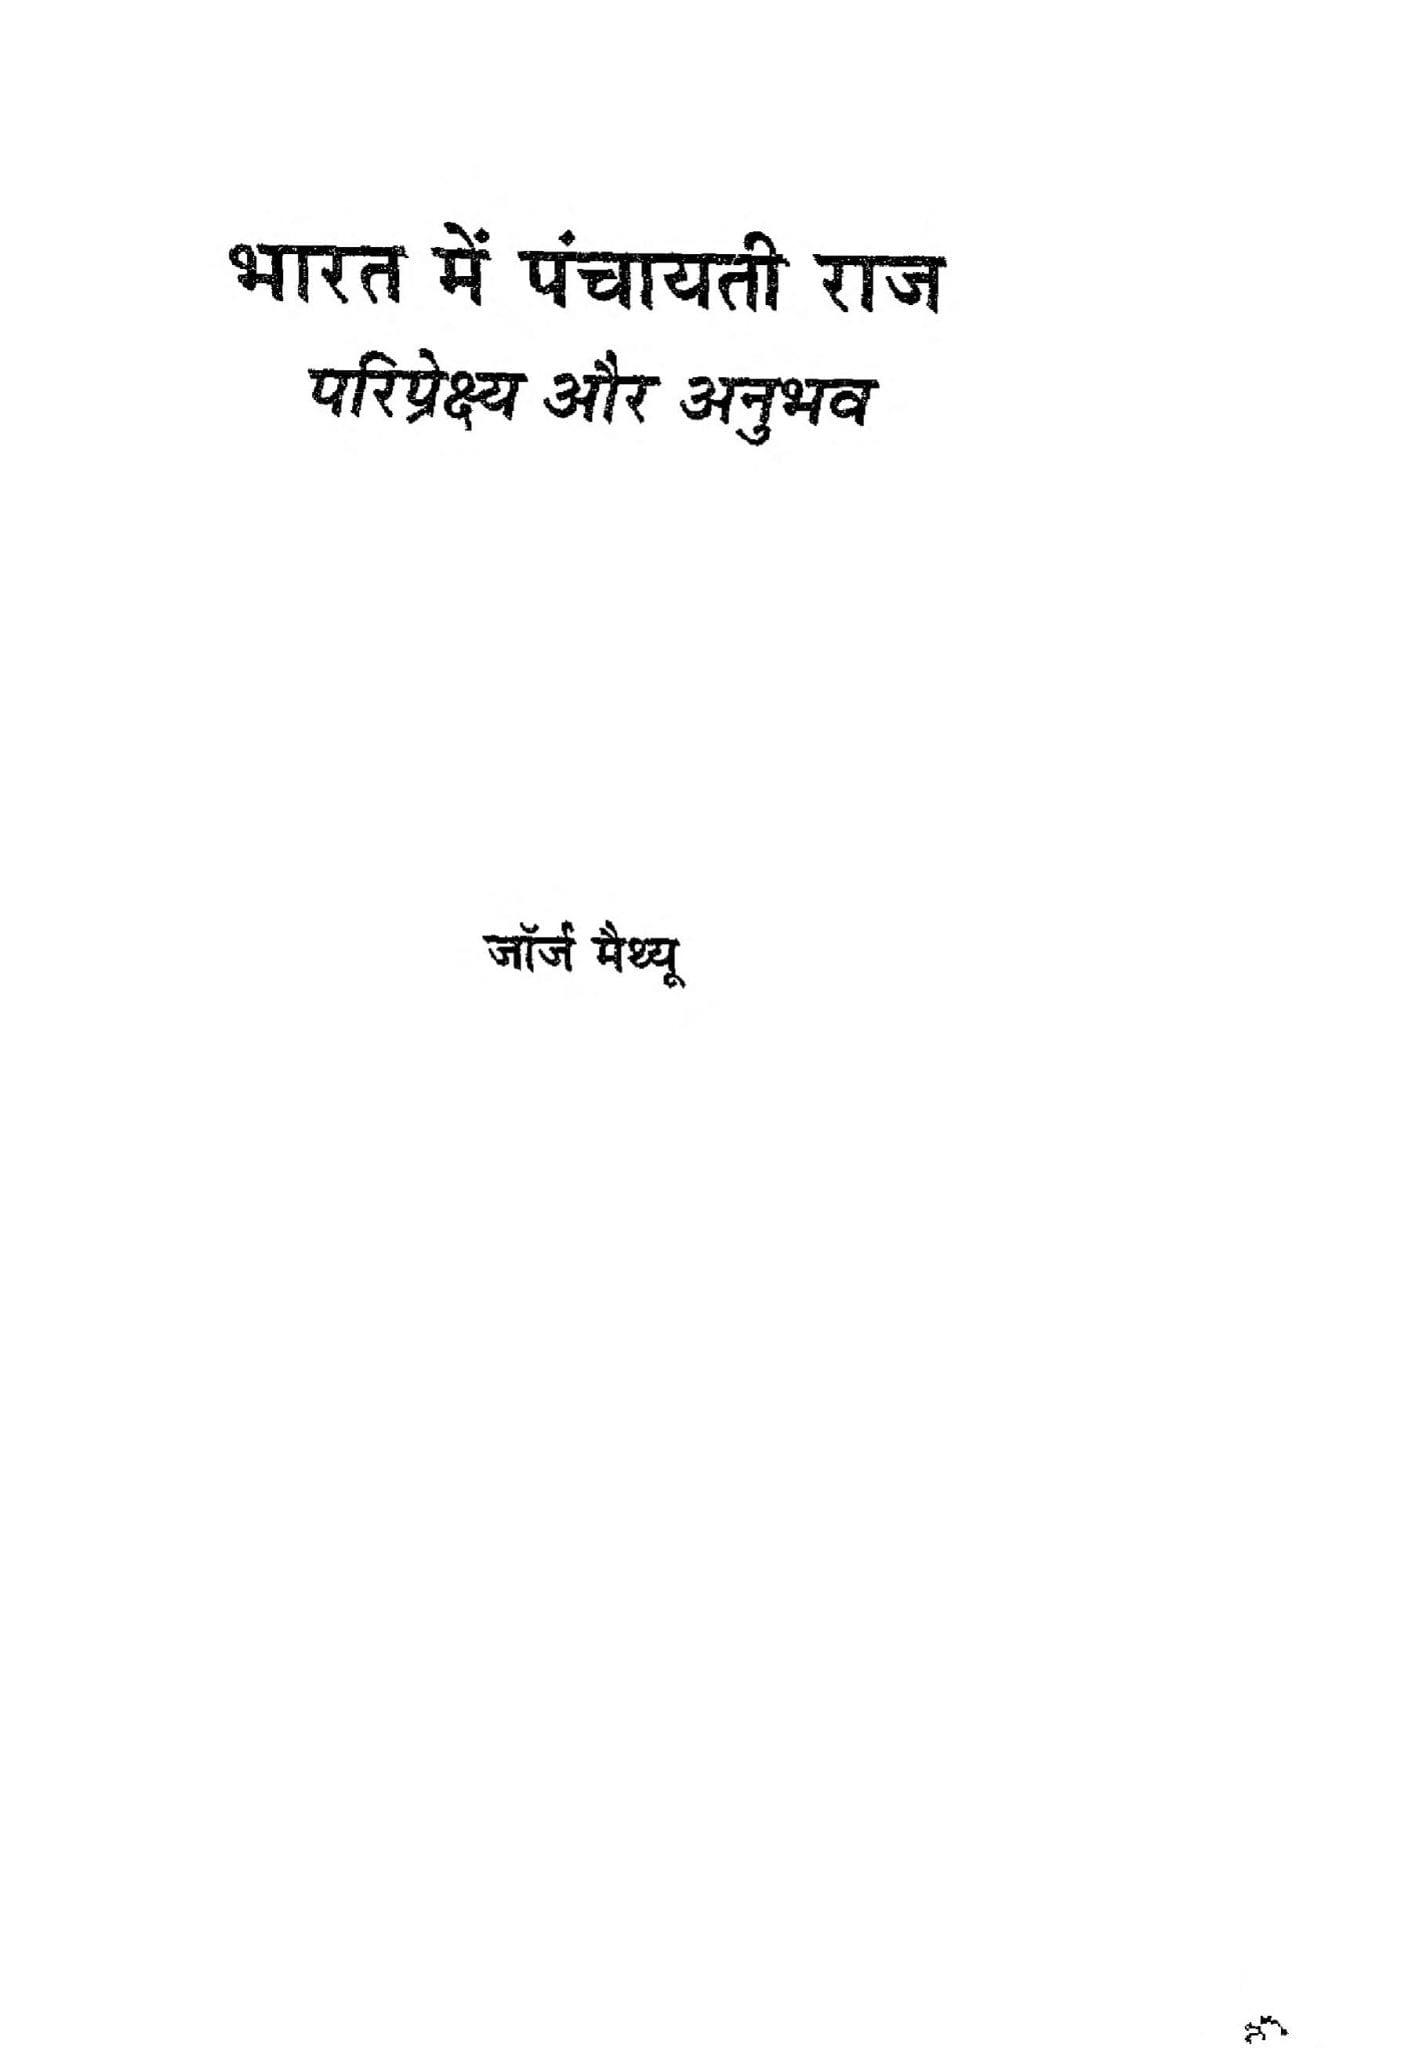 Bhaarat Mein Panchayati Raj Paripreshy Aur Anubhav by जॉर्ज मैथ्यू - George Methew